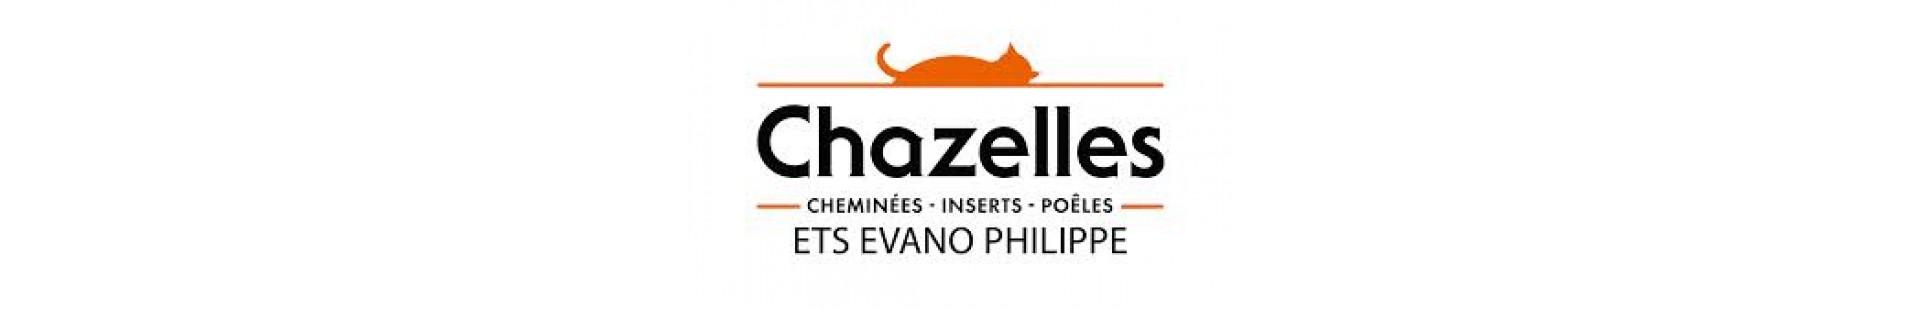 Камины Chazelles (Франция)